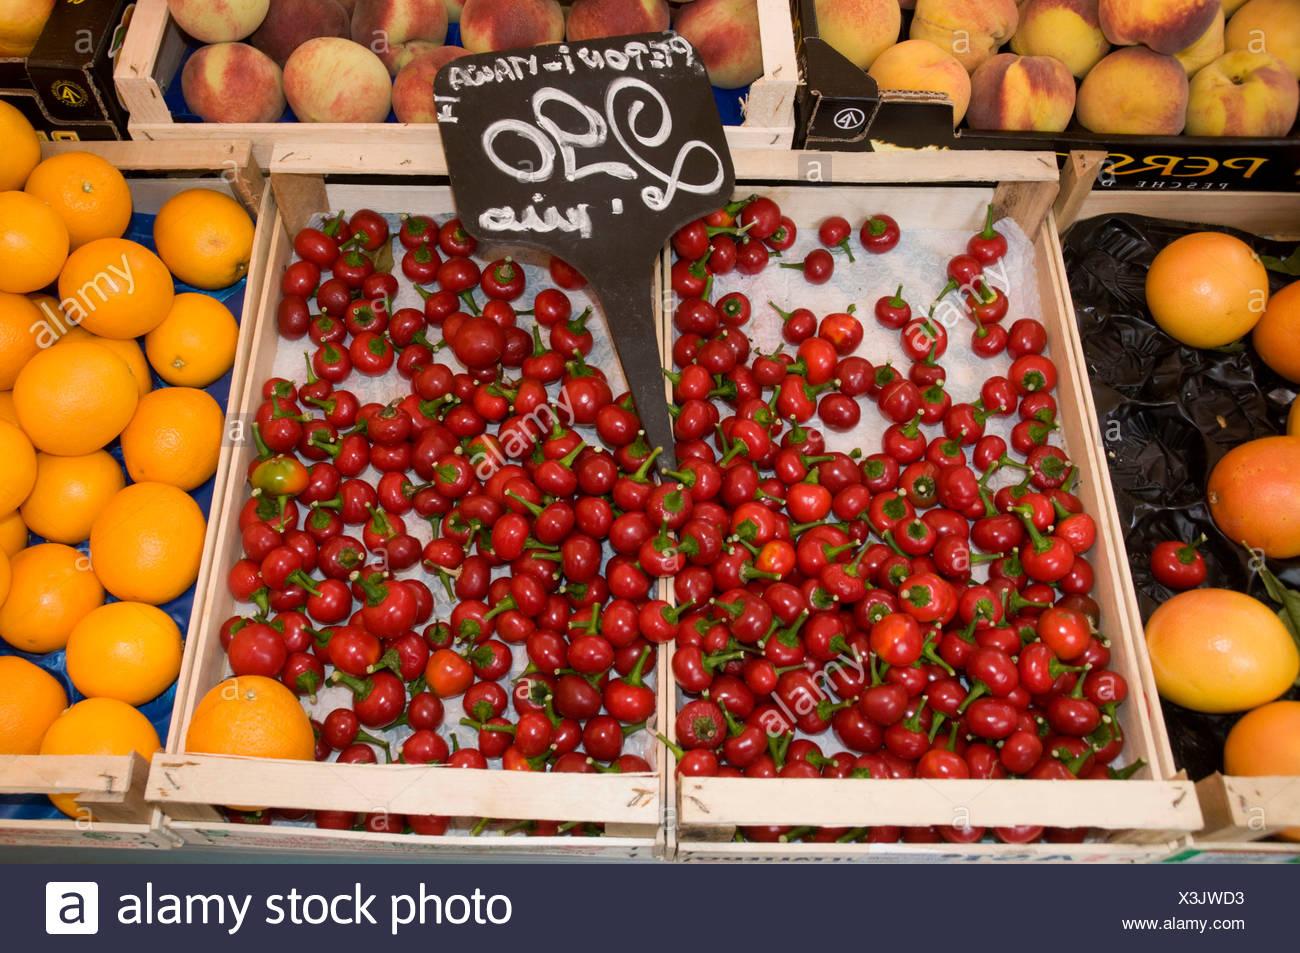 Market stall - Stock Image